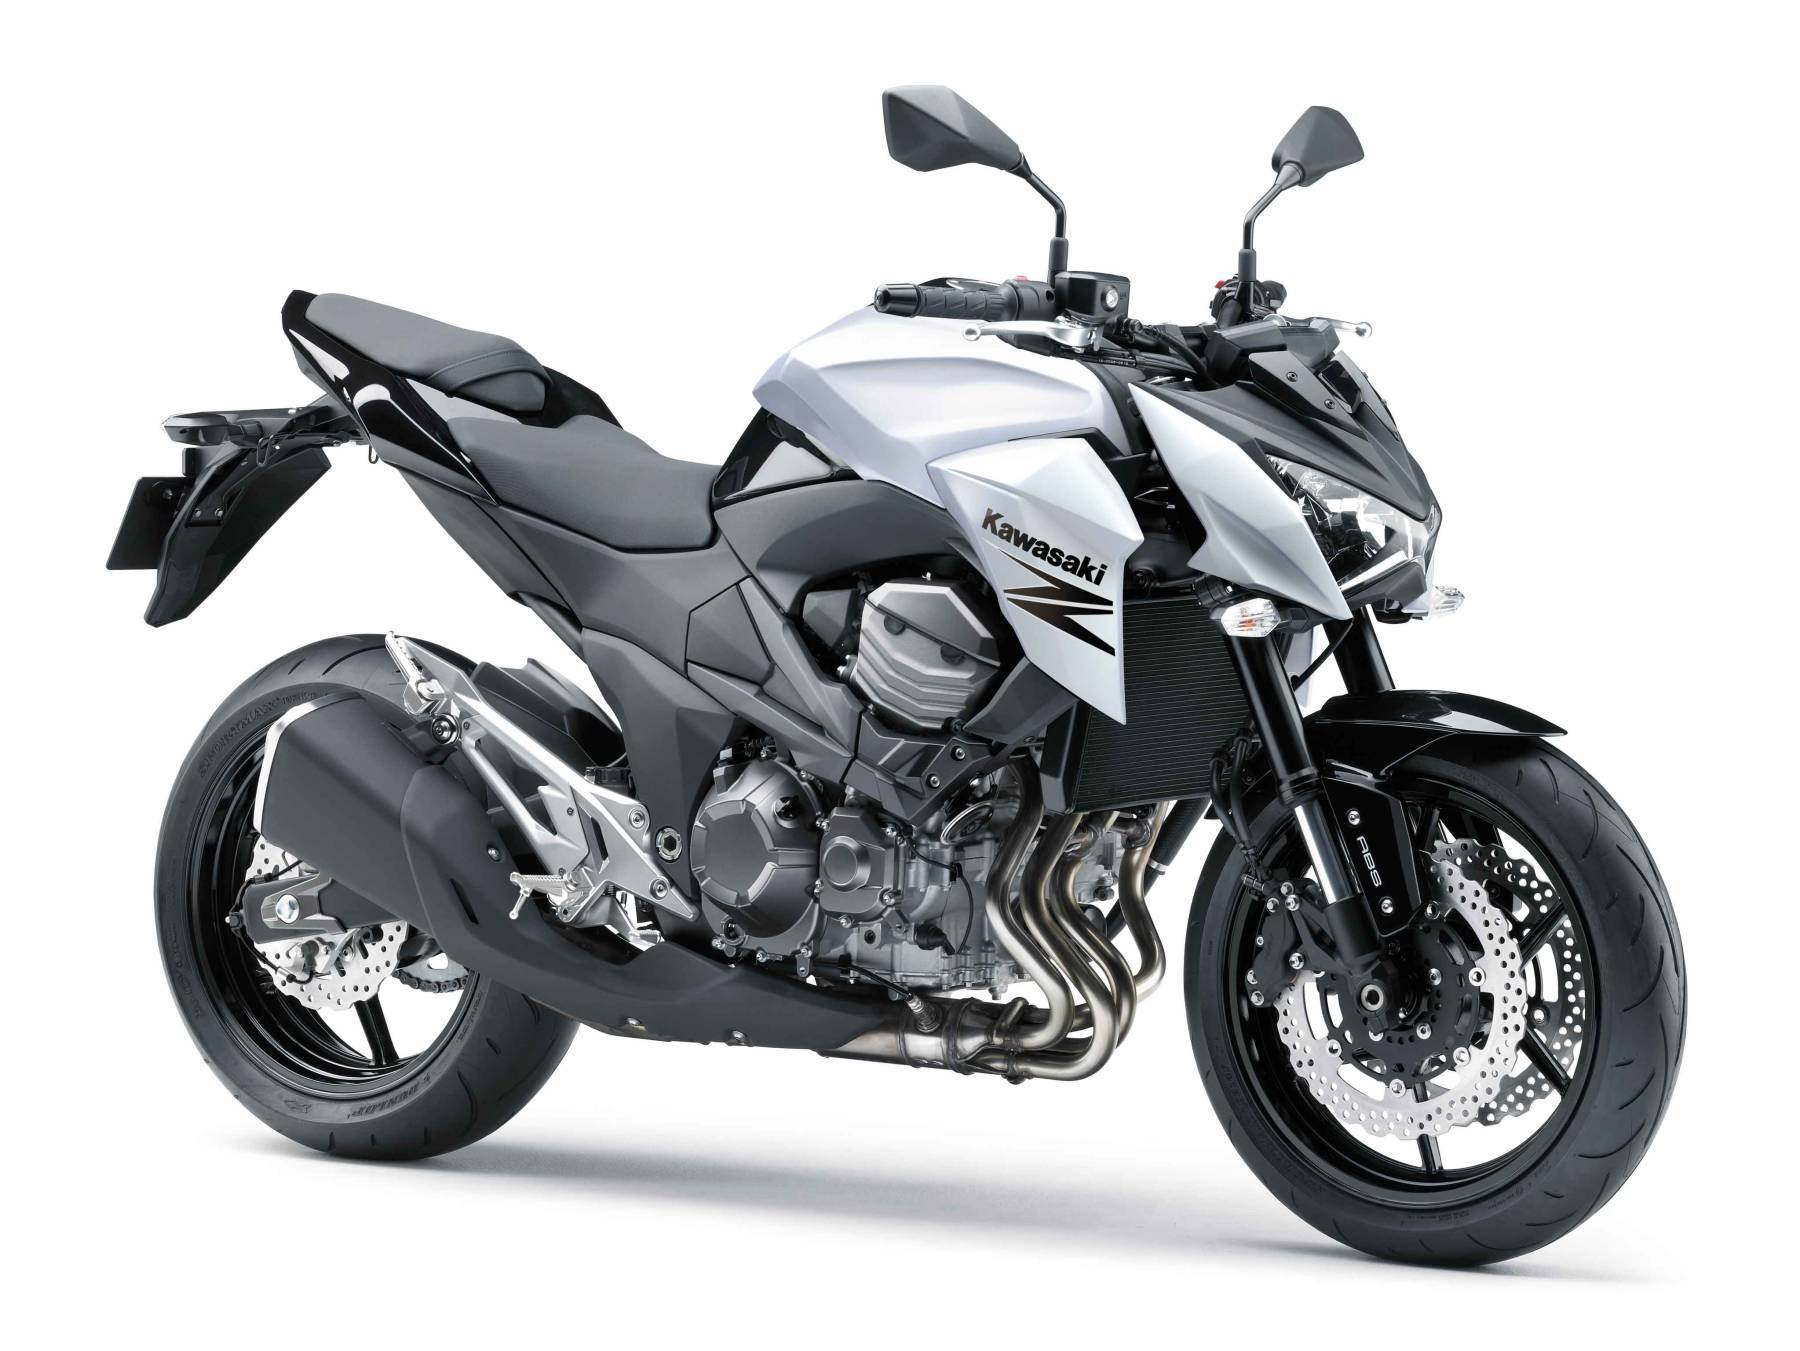 Kawasaki Z800e 2015 - Precio, fotos, ficha técnica y motos rivales